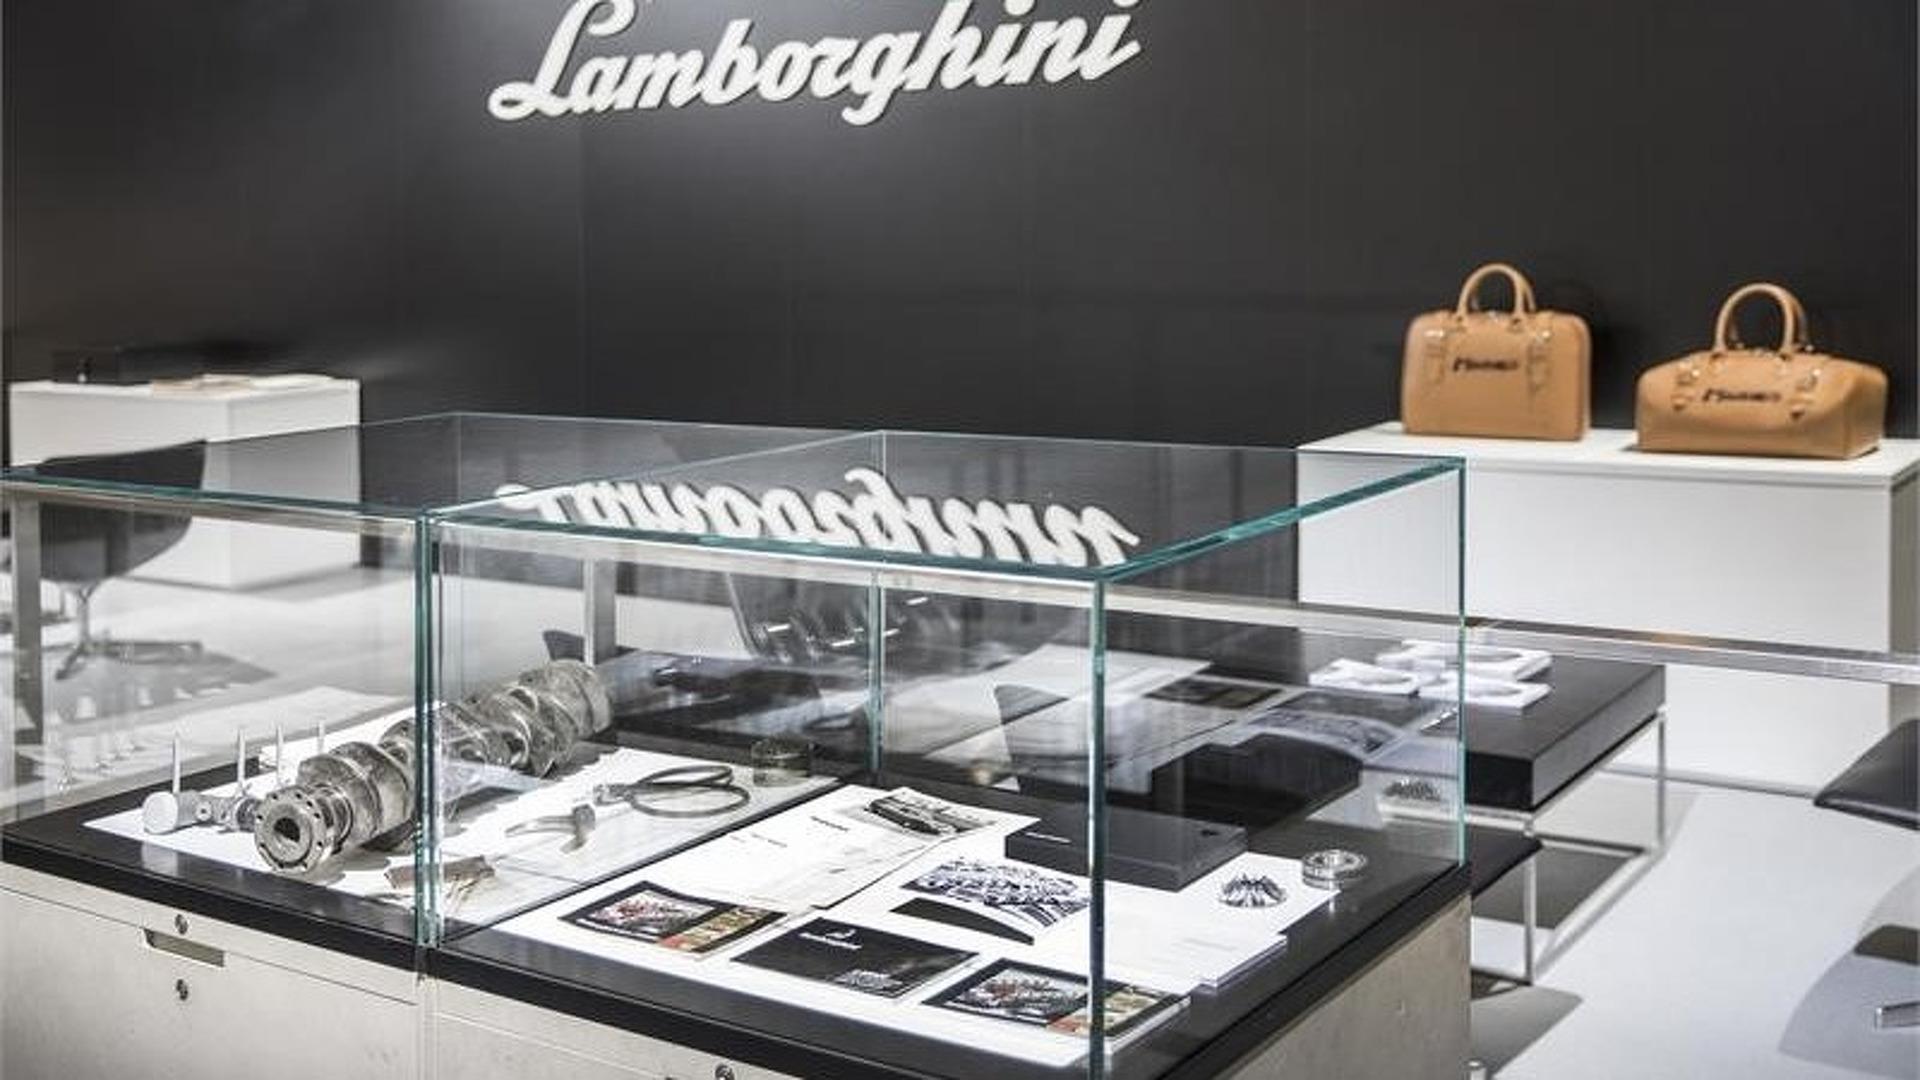 Lamborghini_Miura_SV_restored_05